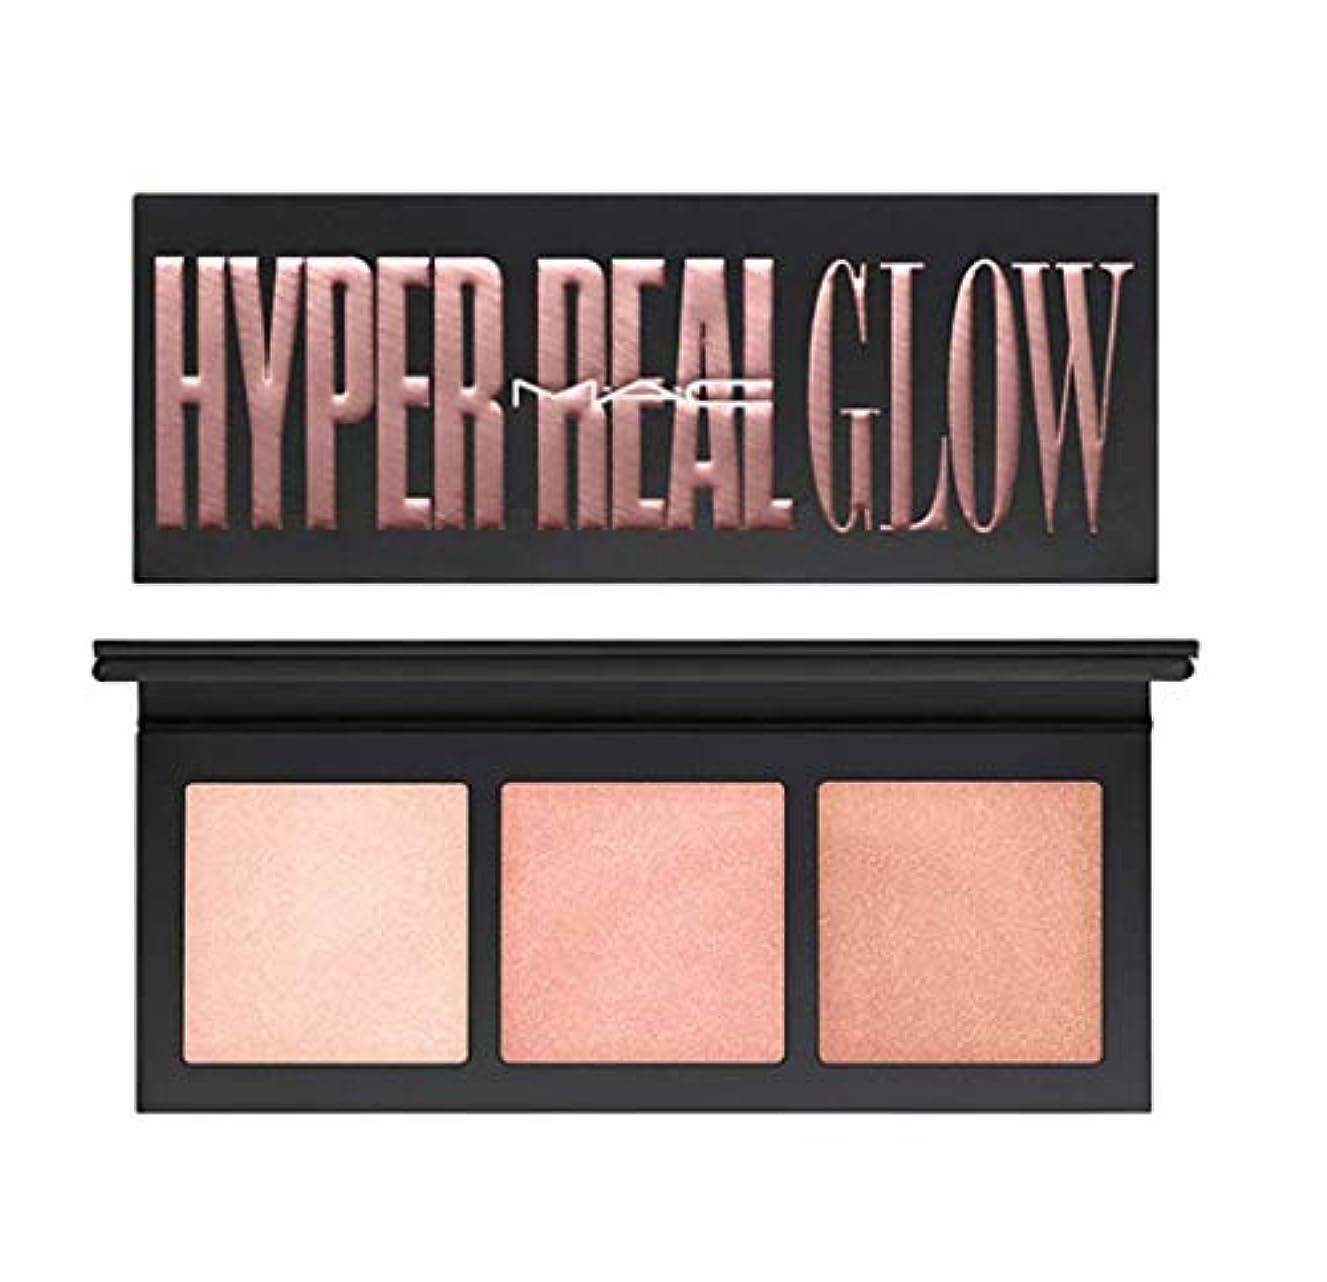 Mac Hyper Real Glow Palette - Flash + Awe (マック) ハイパー リアル グロー パレット (フラッシュ + オー)(並行輸入品)